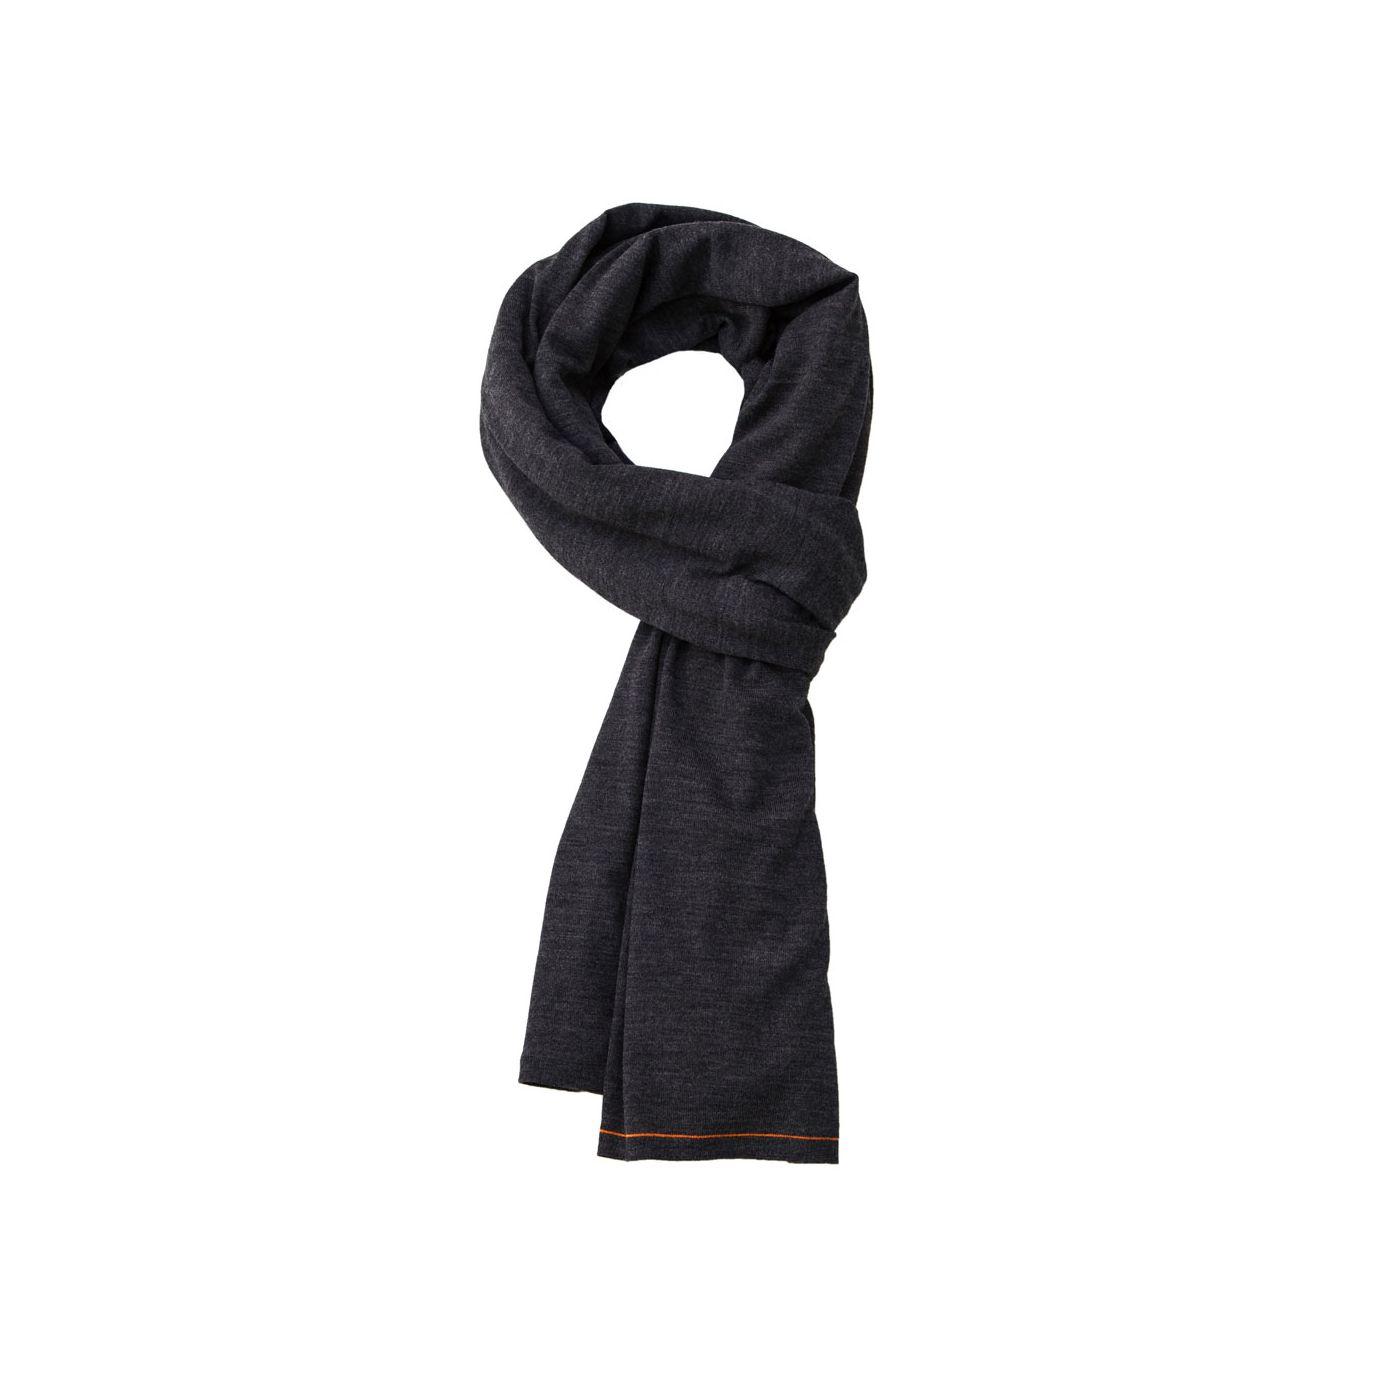 Scarf for men made of Merino wool in Dark grey